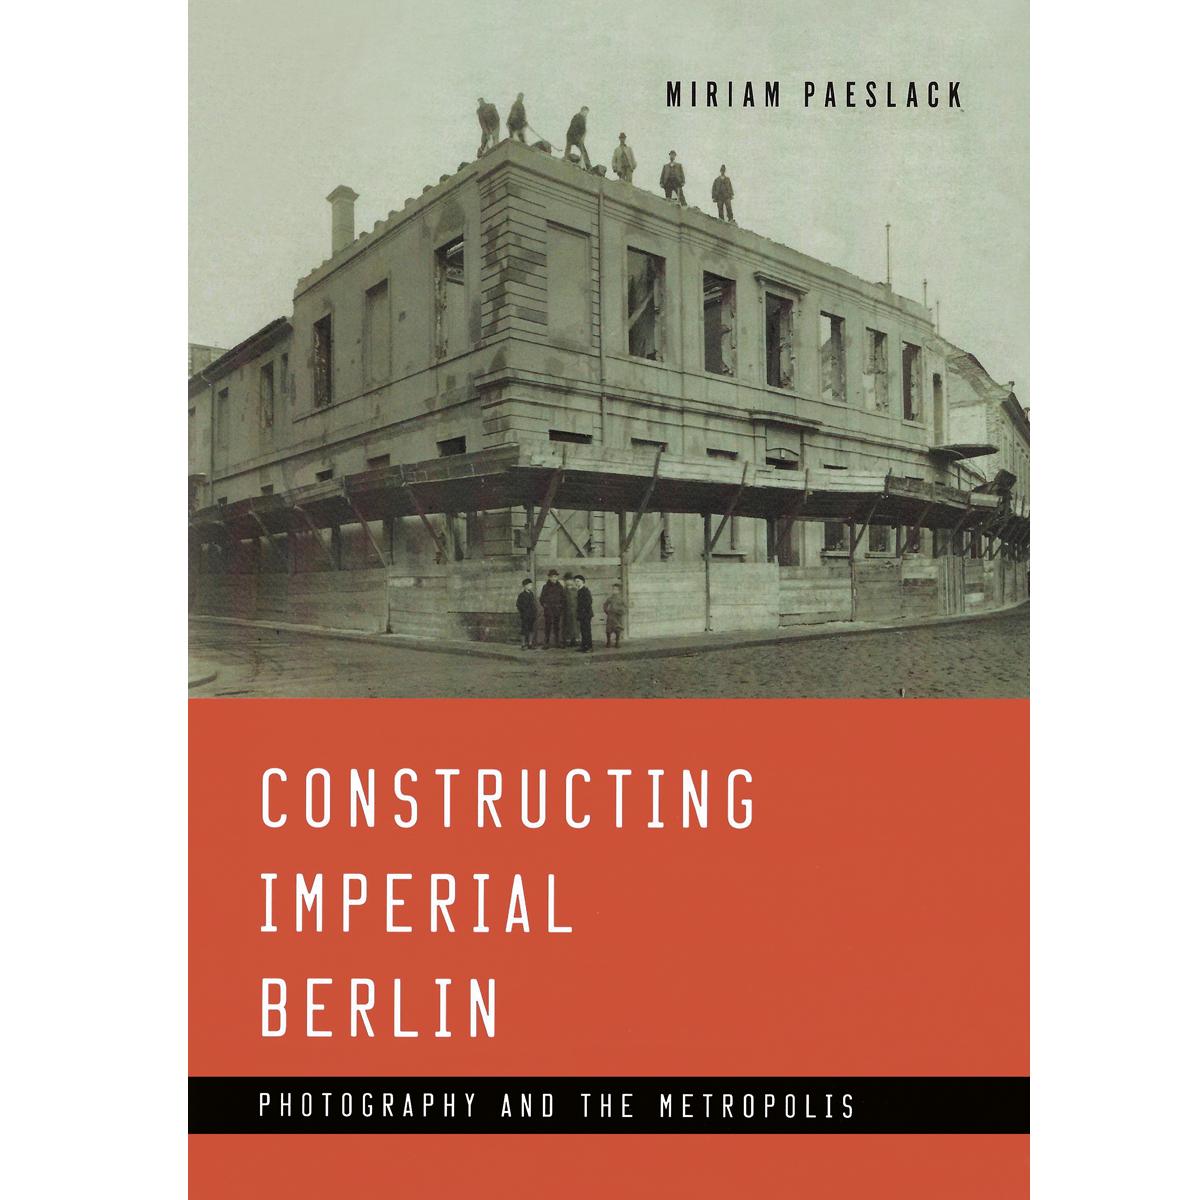 Constructing Imperial Berlin